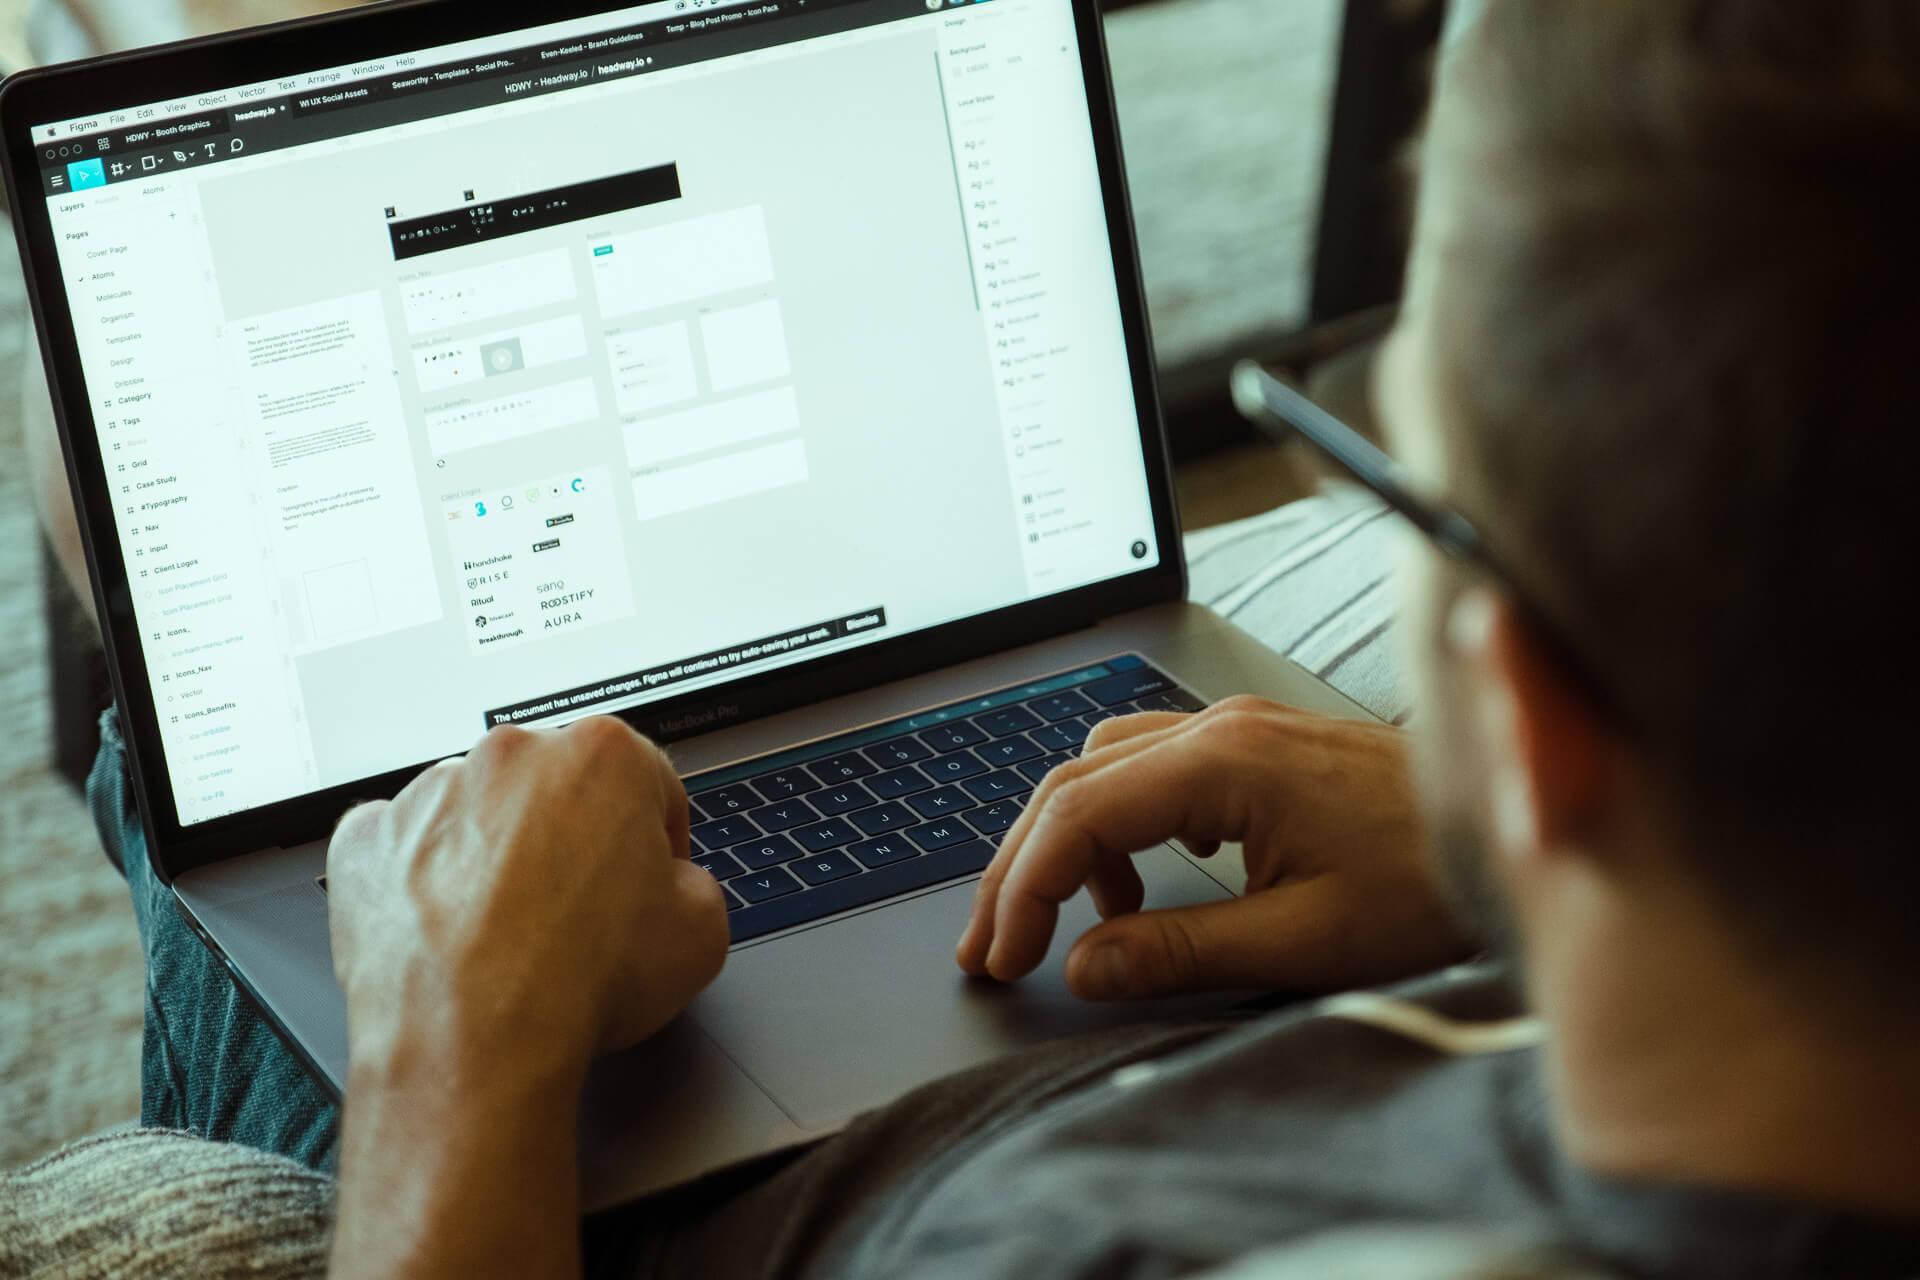 designer editing in figma on macbook